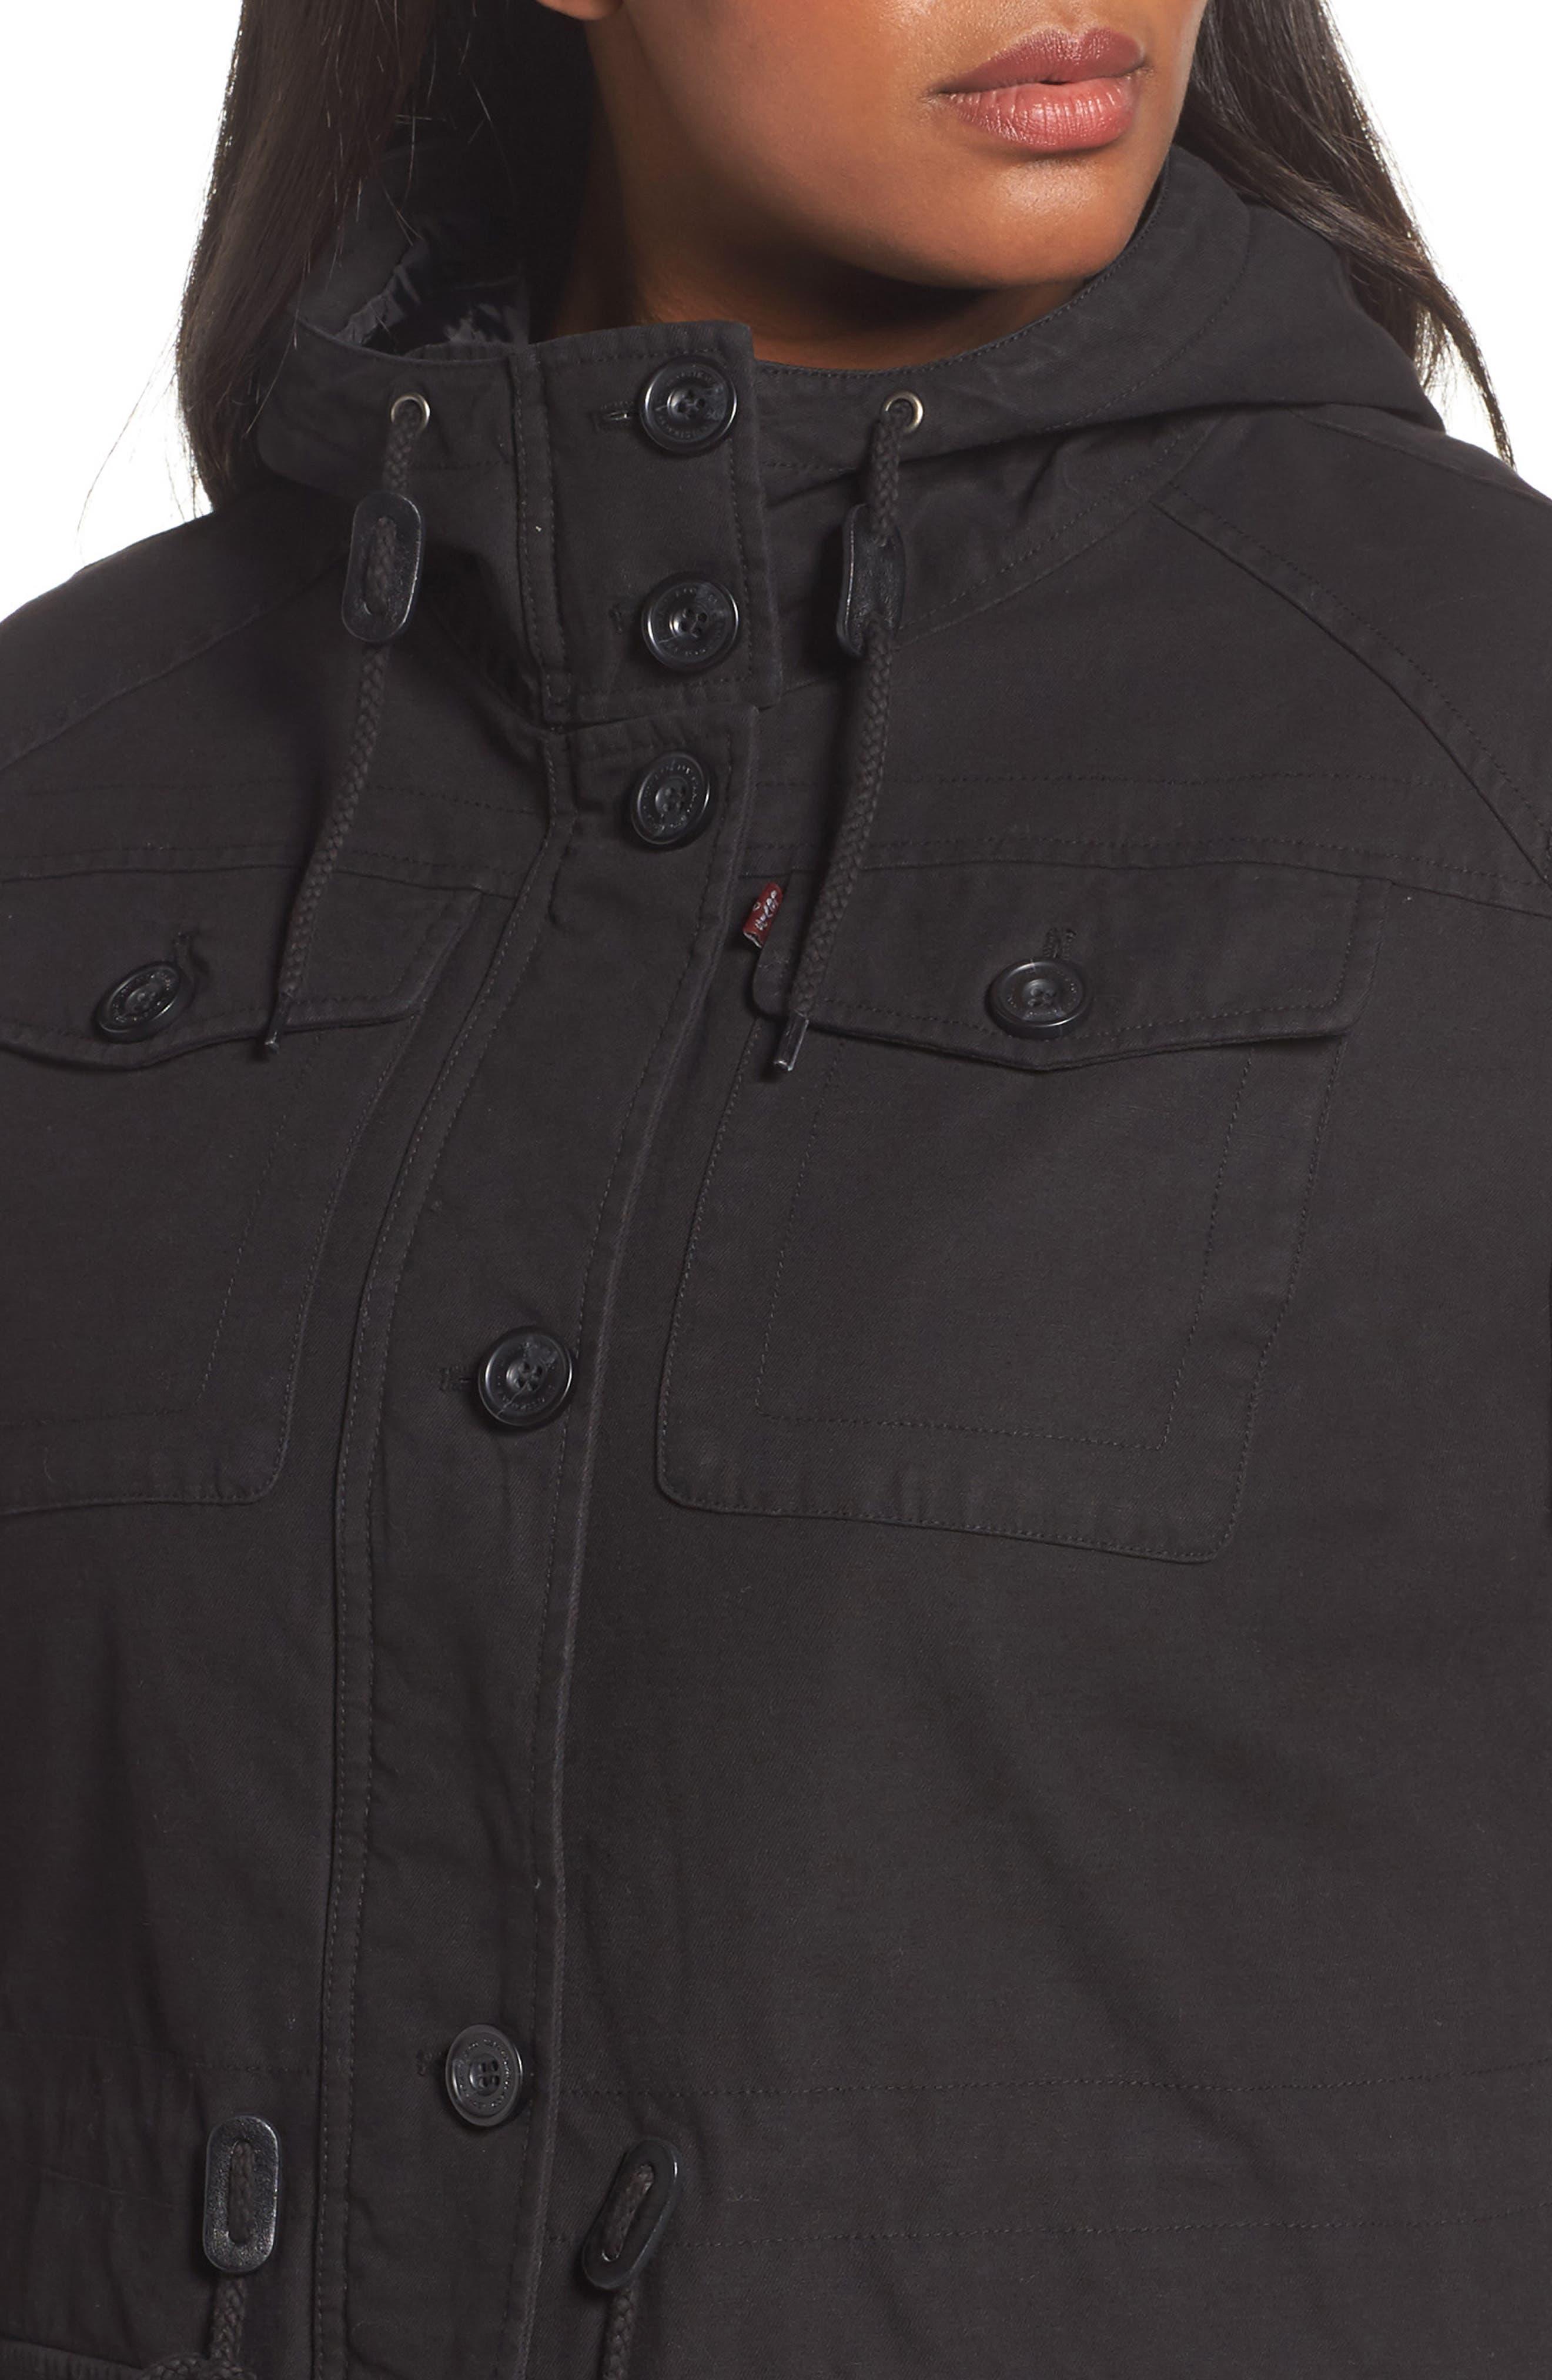 Hooded Cotton Utility Jacket,                             Alternate thumbnail 4, color,                             001